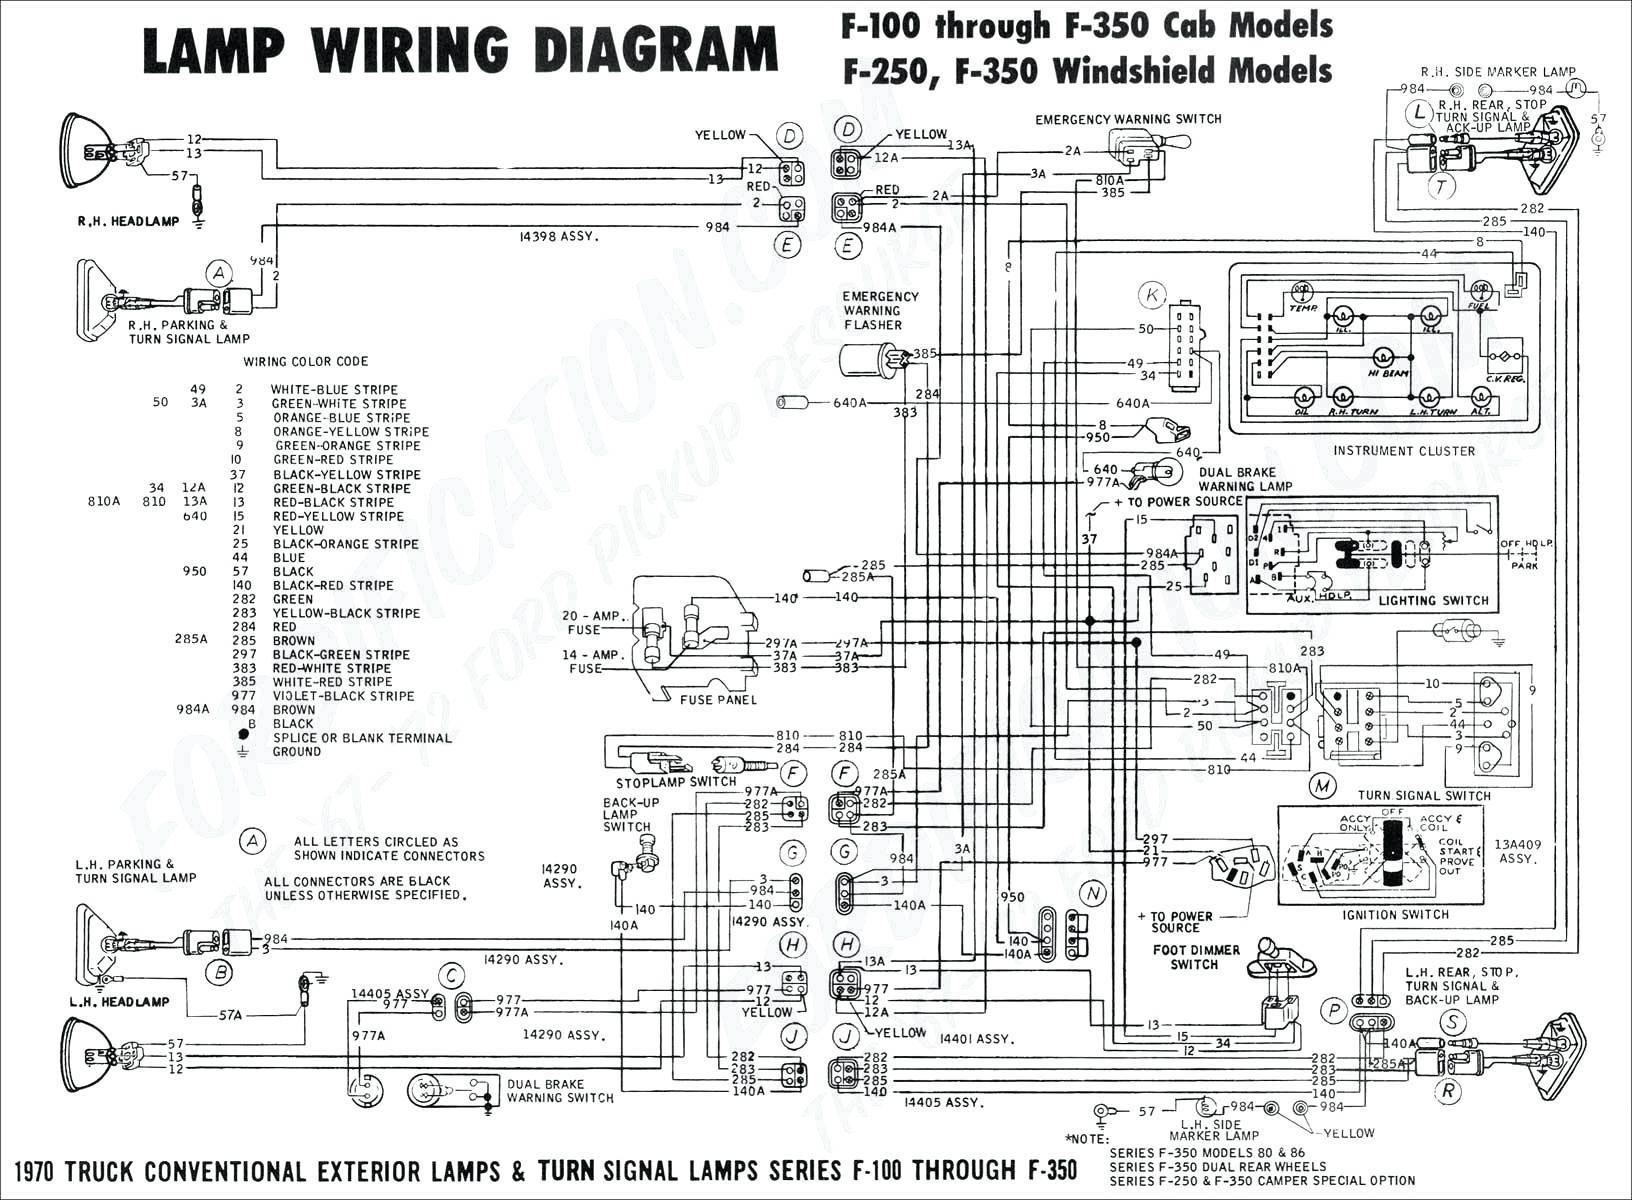 2004 Gmc Sierra Wiring Diagram 2005 Gmc Sierra 2500hd Wiring Diagram Wiring Diagram toolbox Of 2004 Gmc Sierra Wiring Diagram